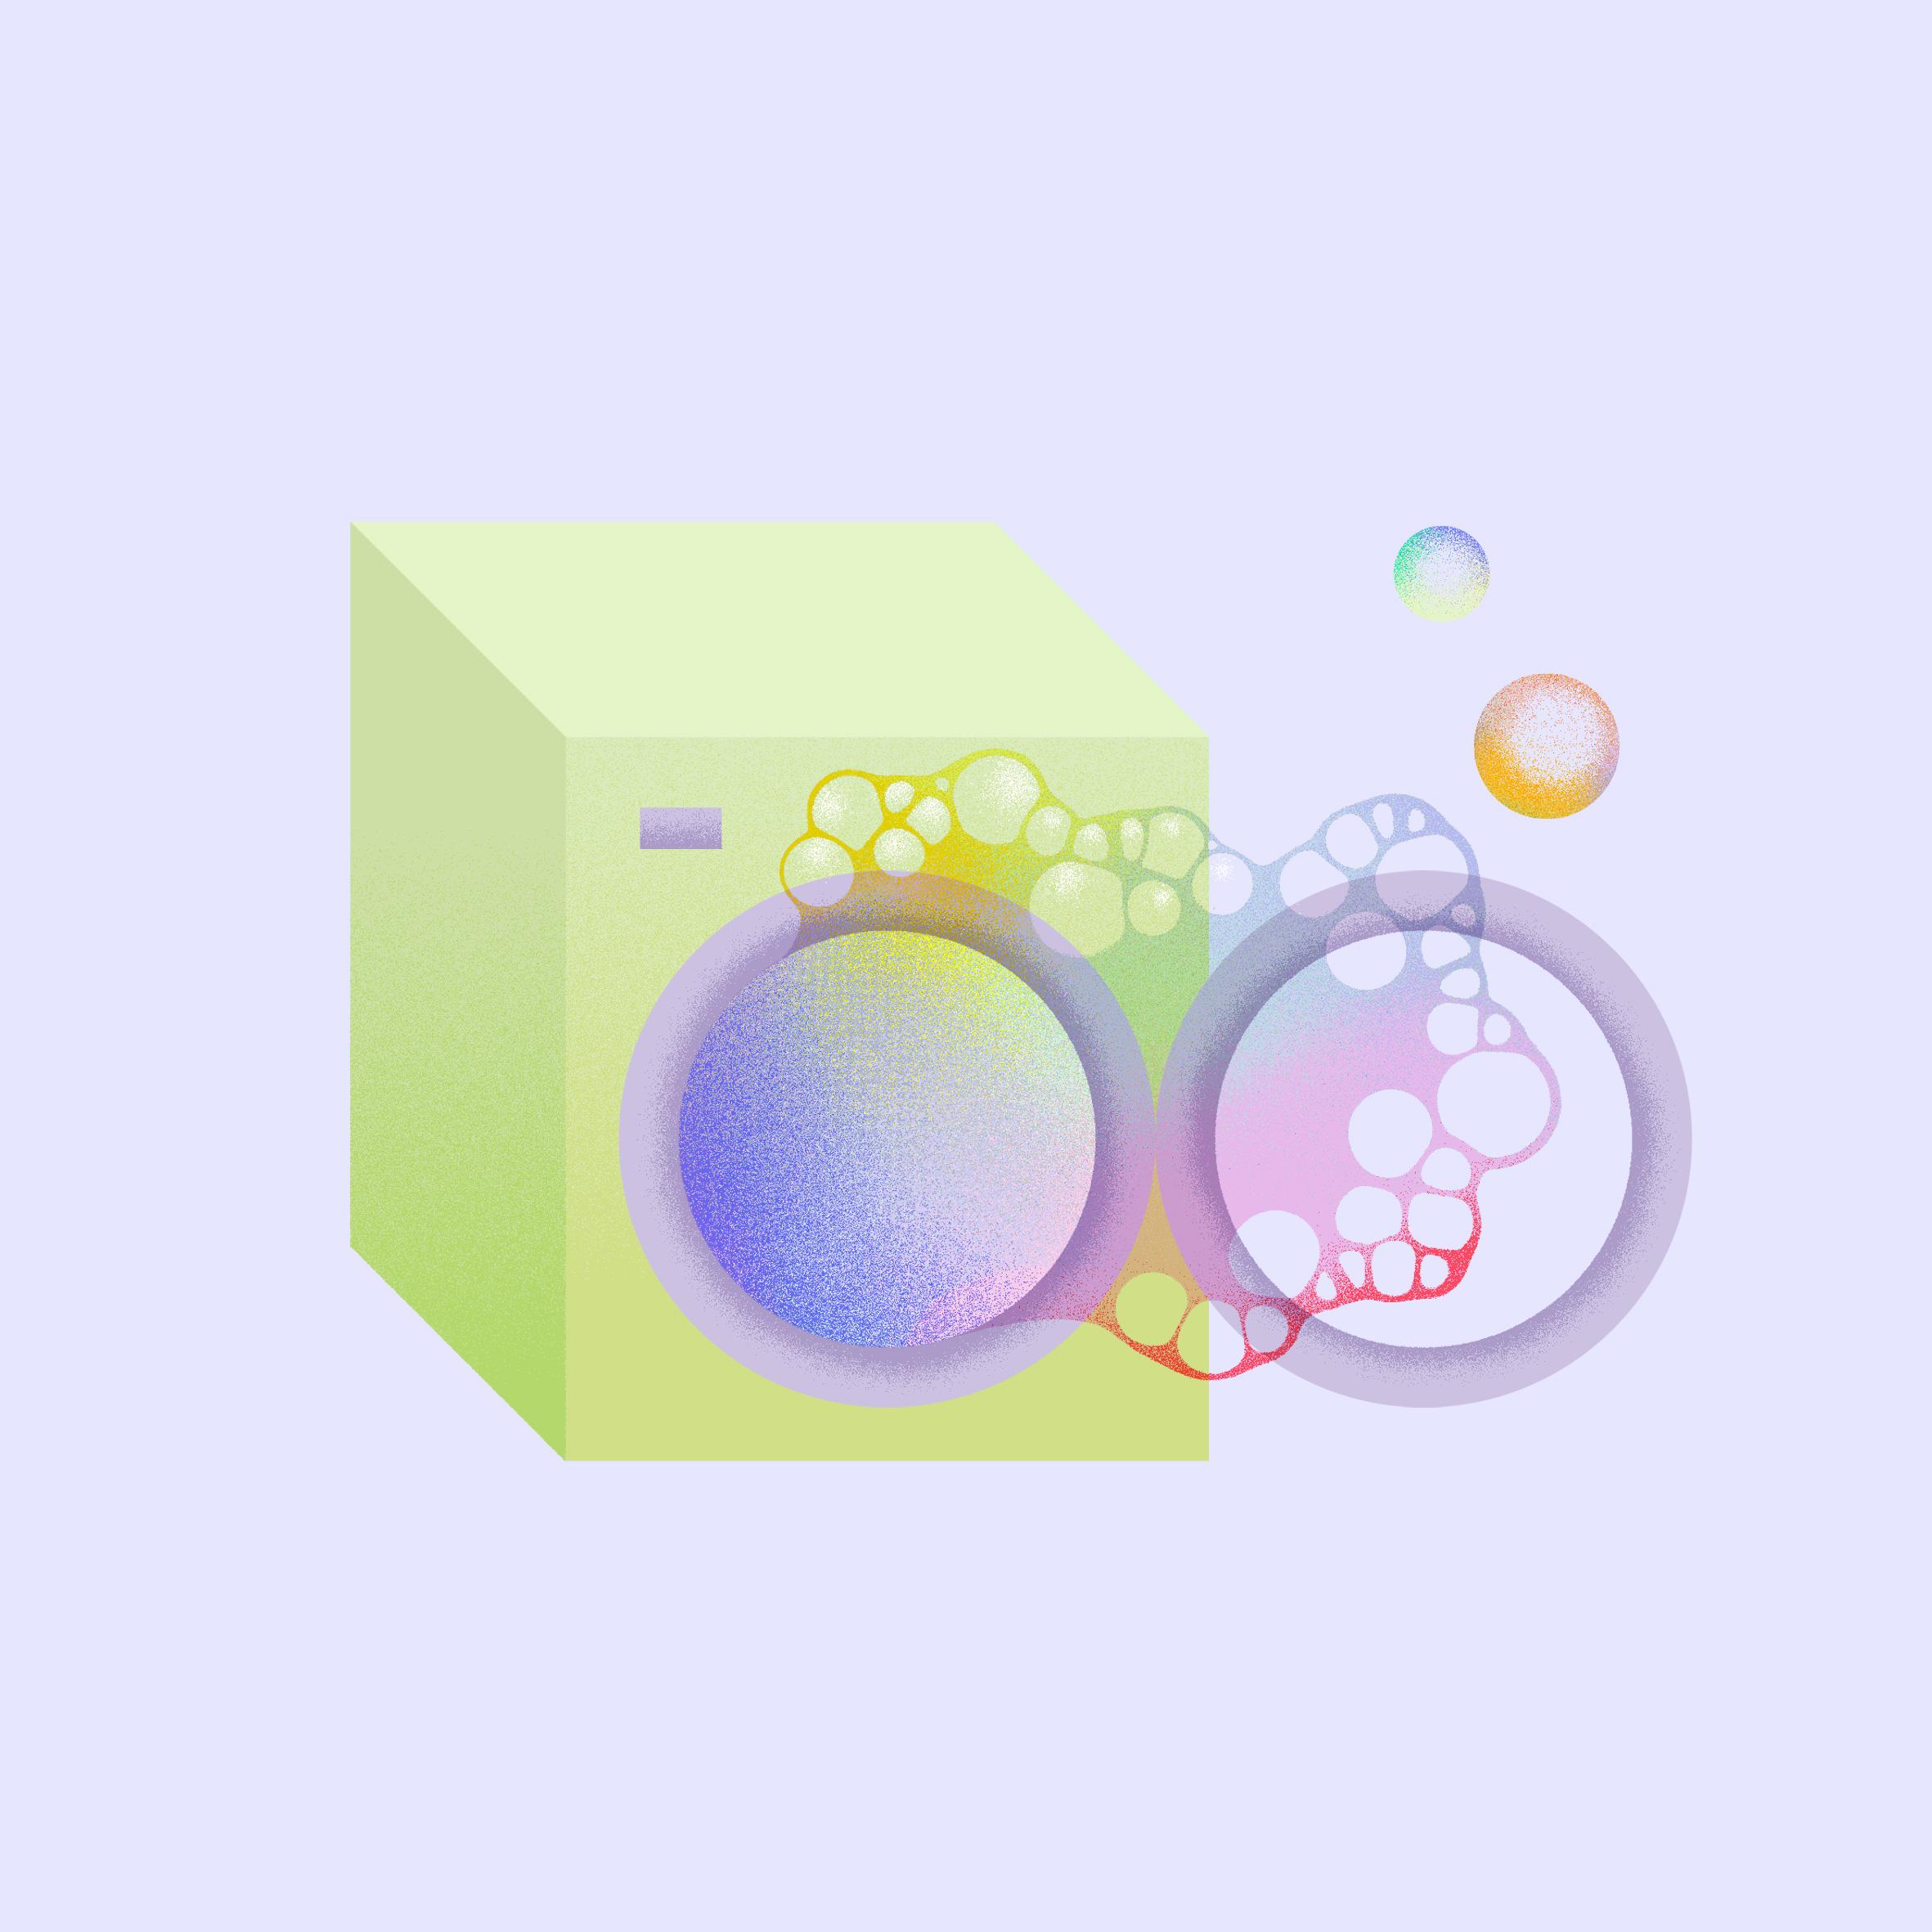 7_VogueJapan_Fashion-goes-Social_Washingcontent